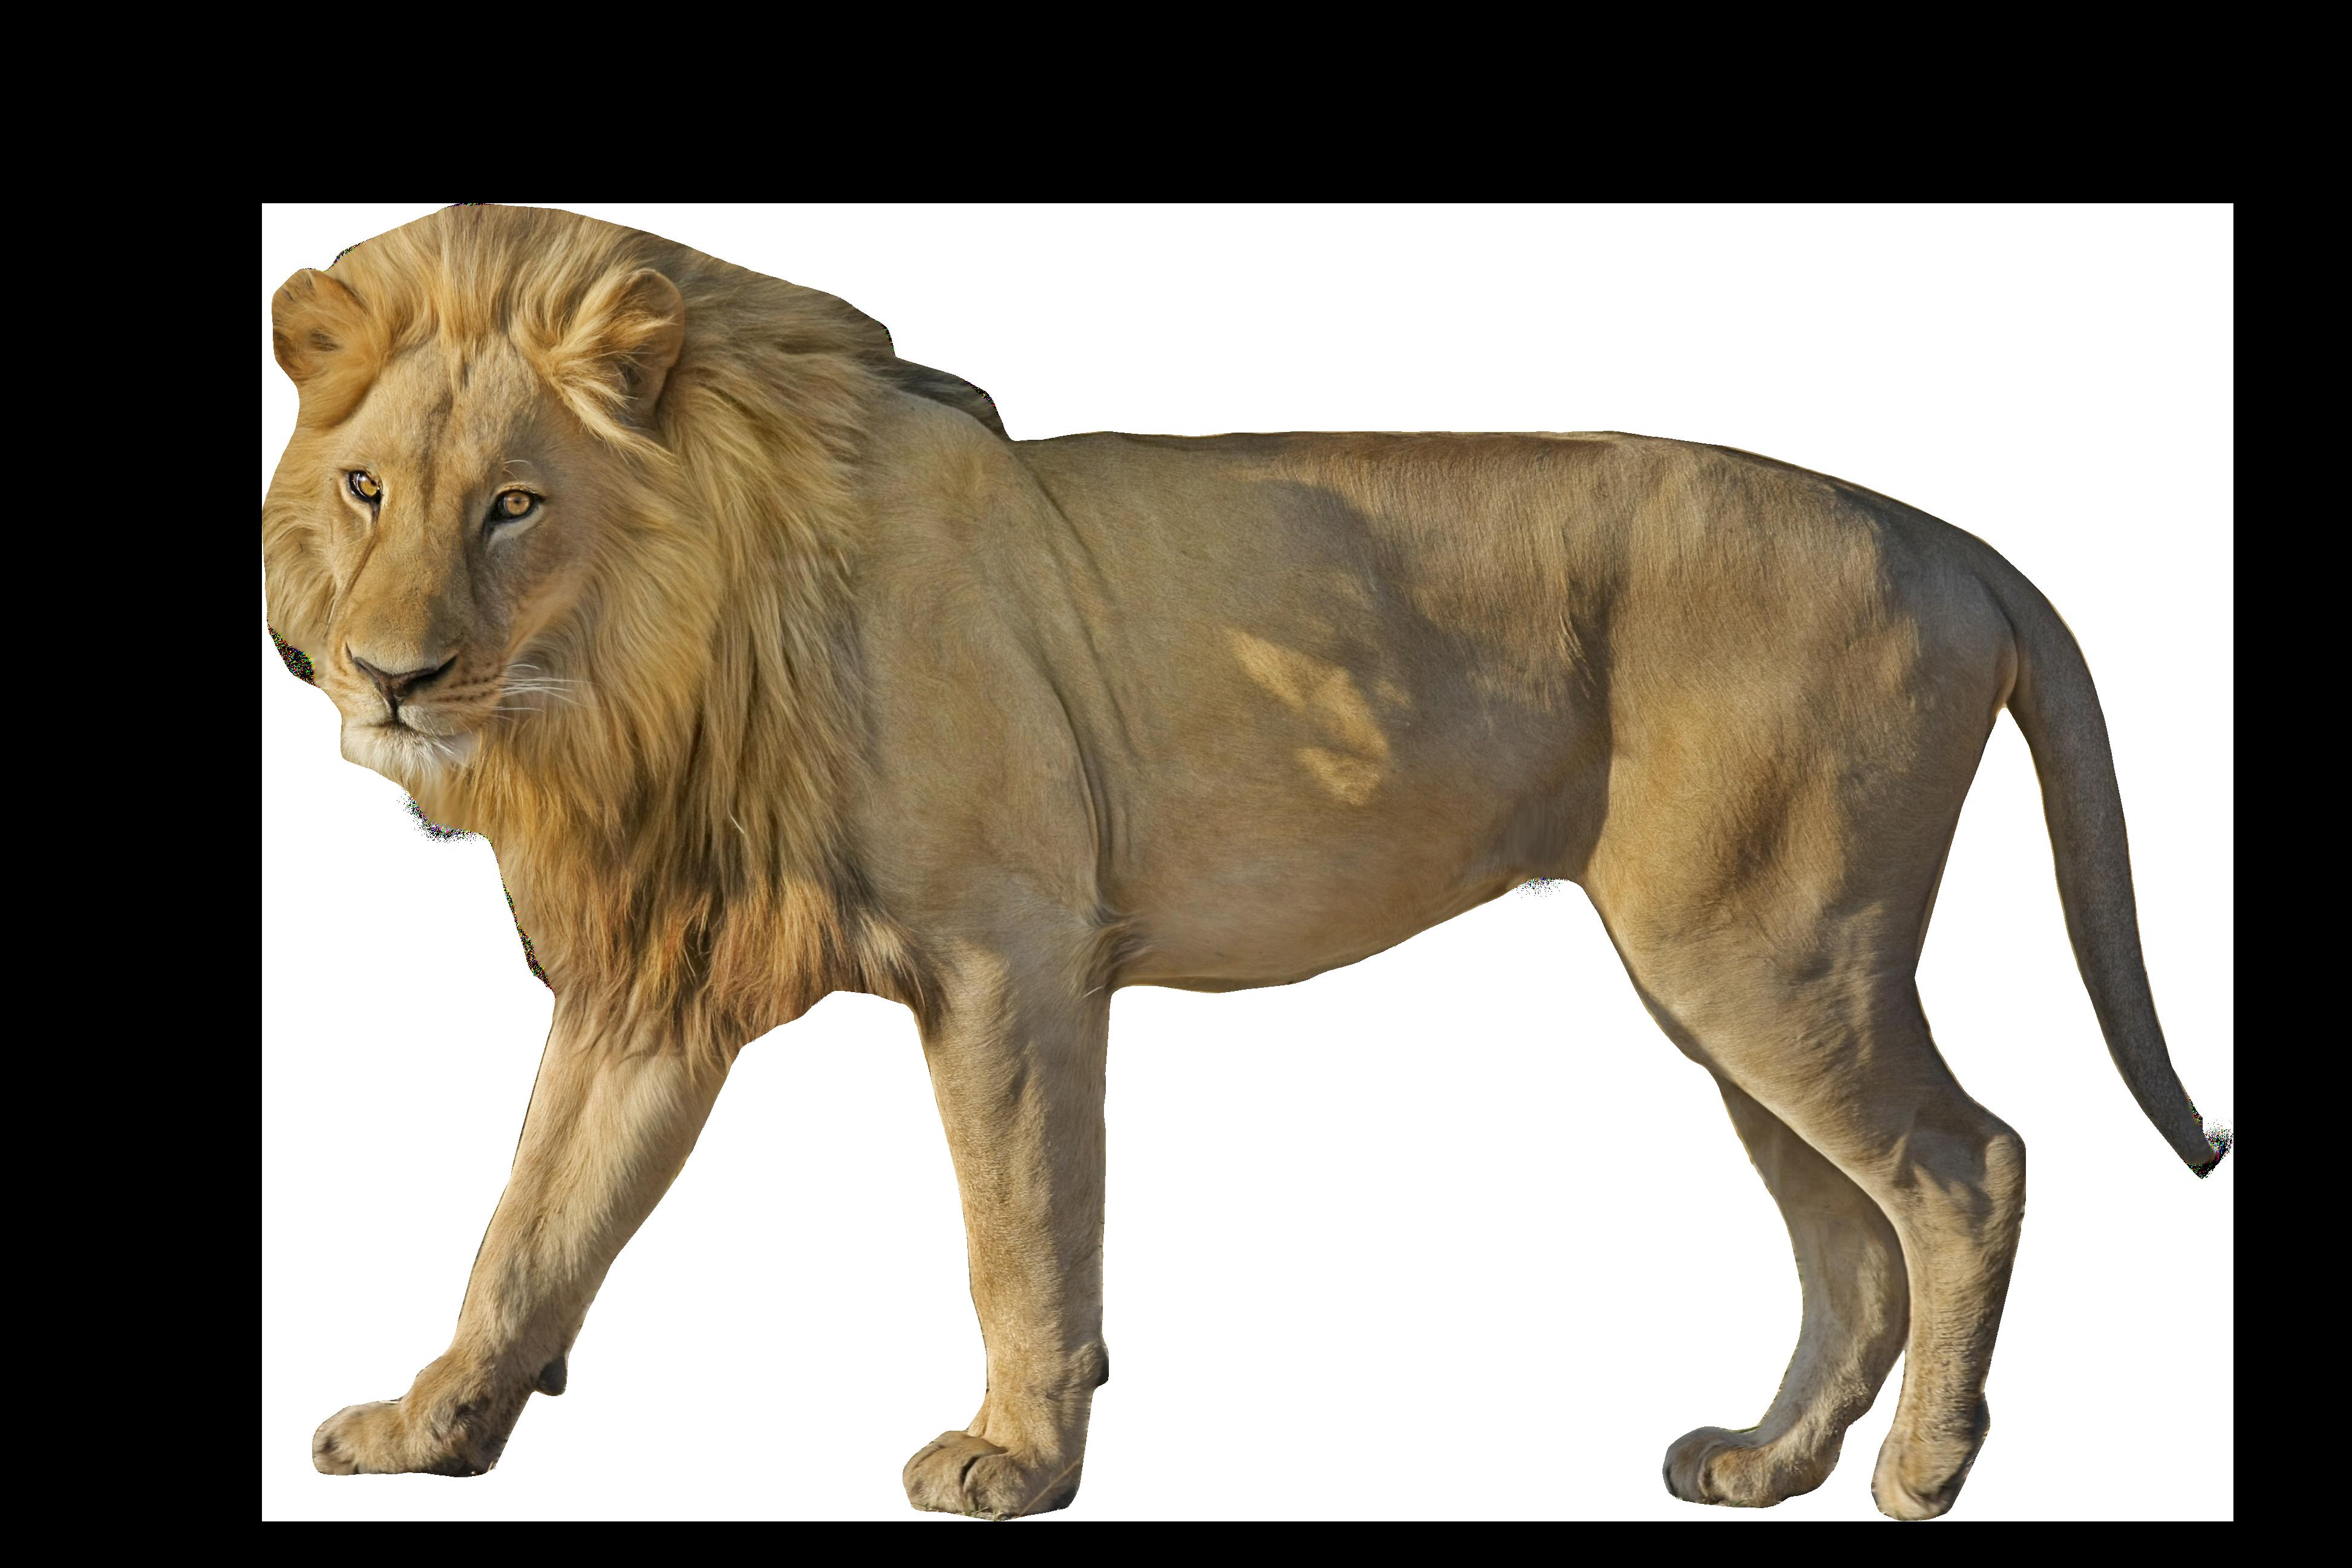 Wildcat clipart cheetah. Lion standing png image